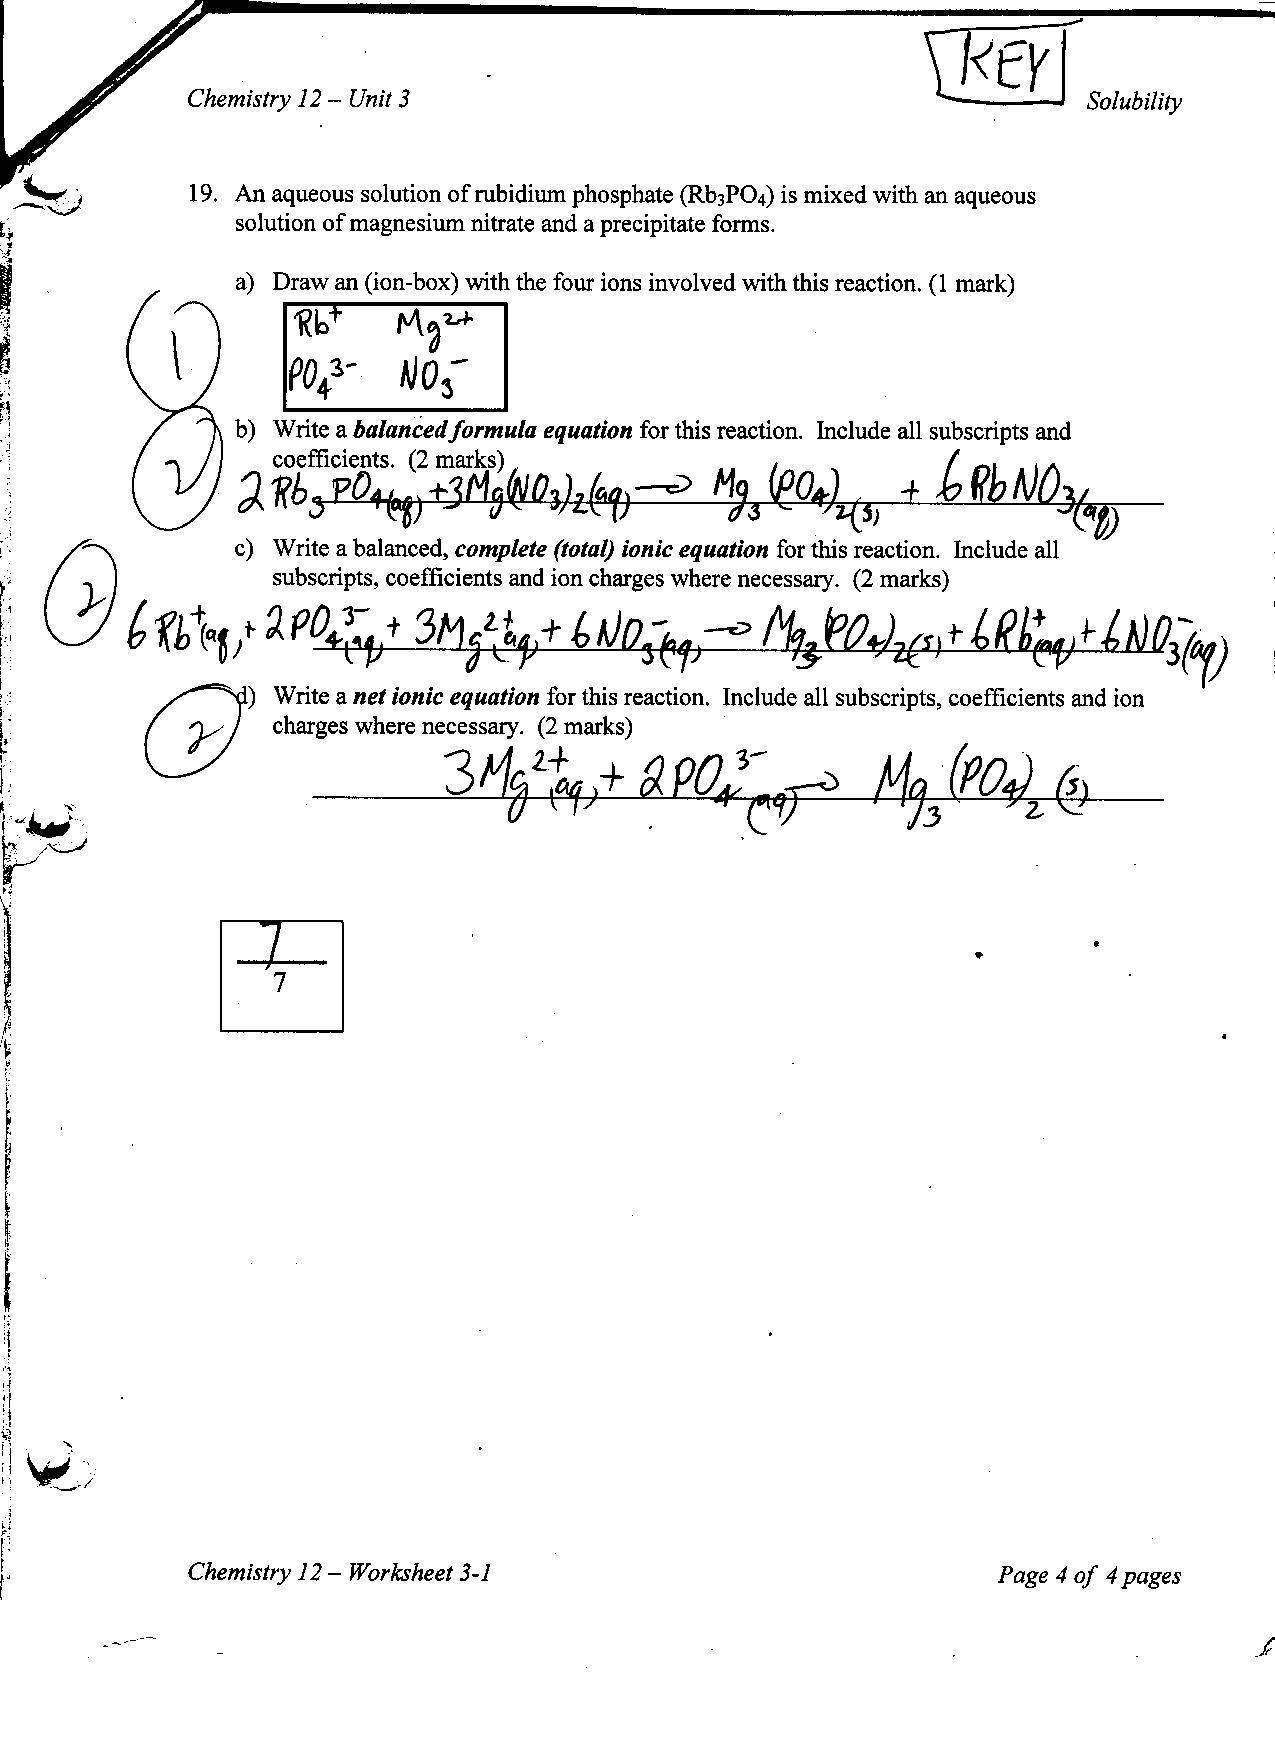 Chemistry Dataysis Worksheets